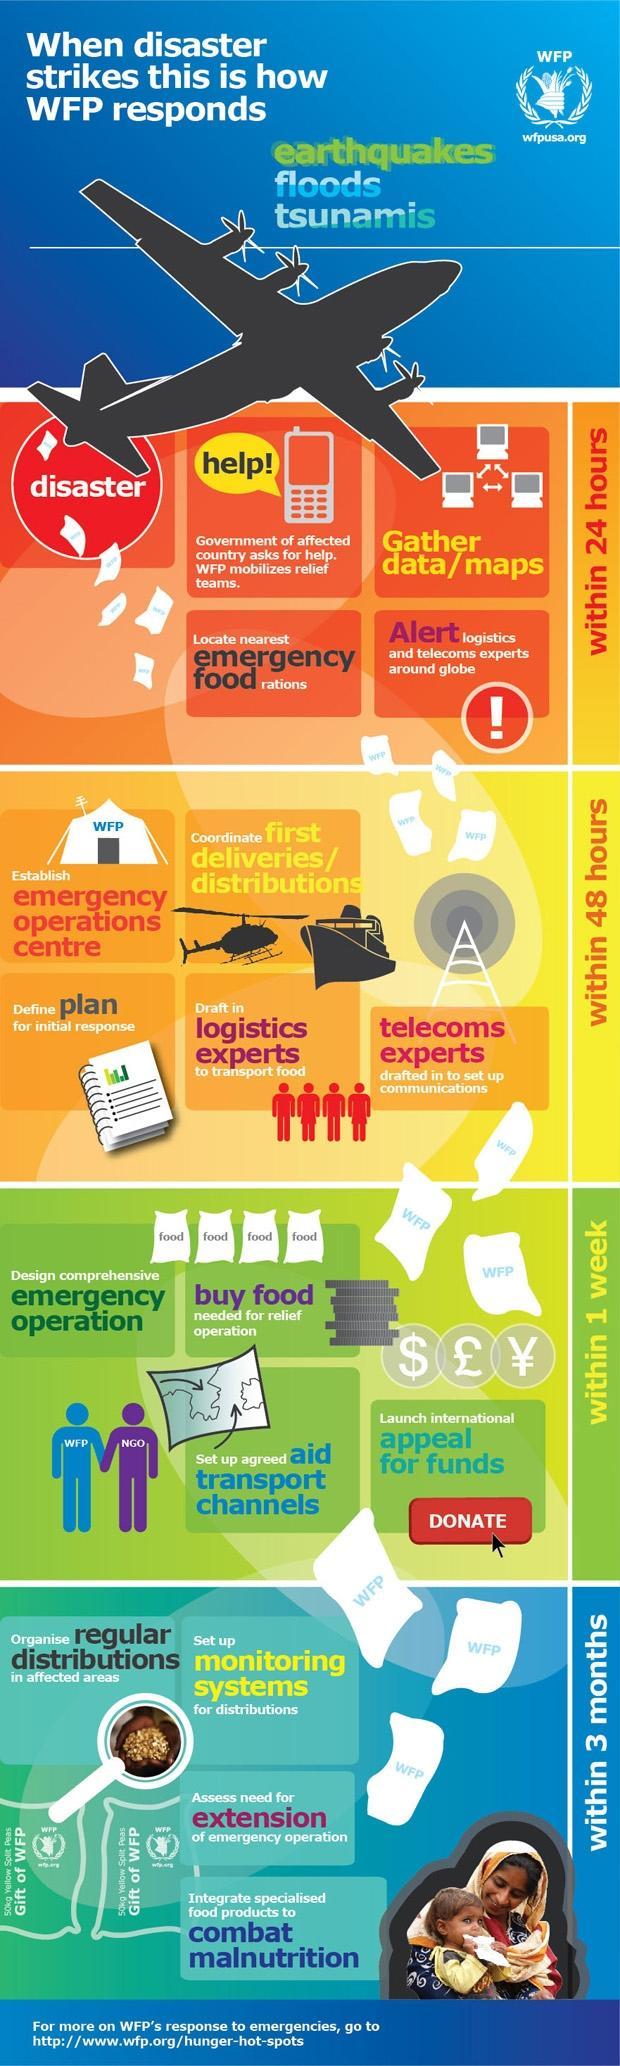 emergency management field essay